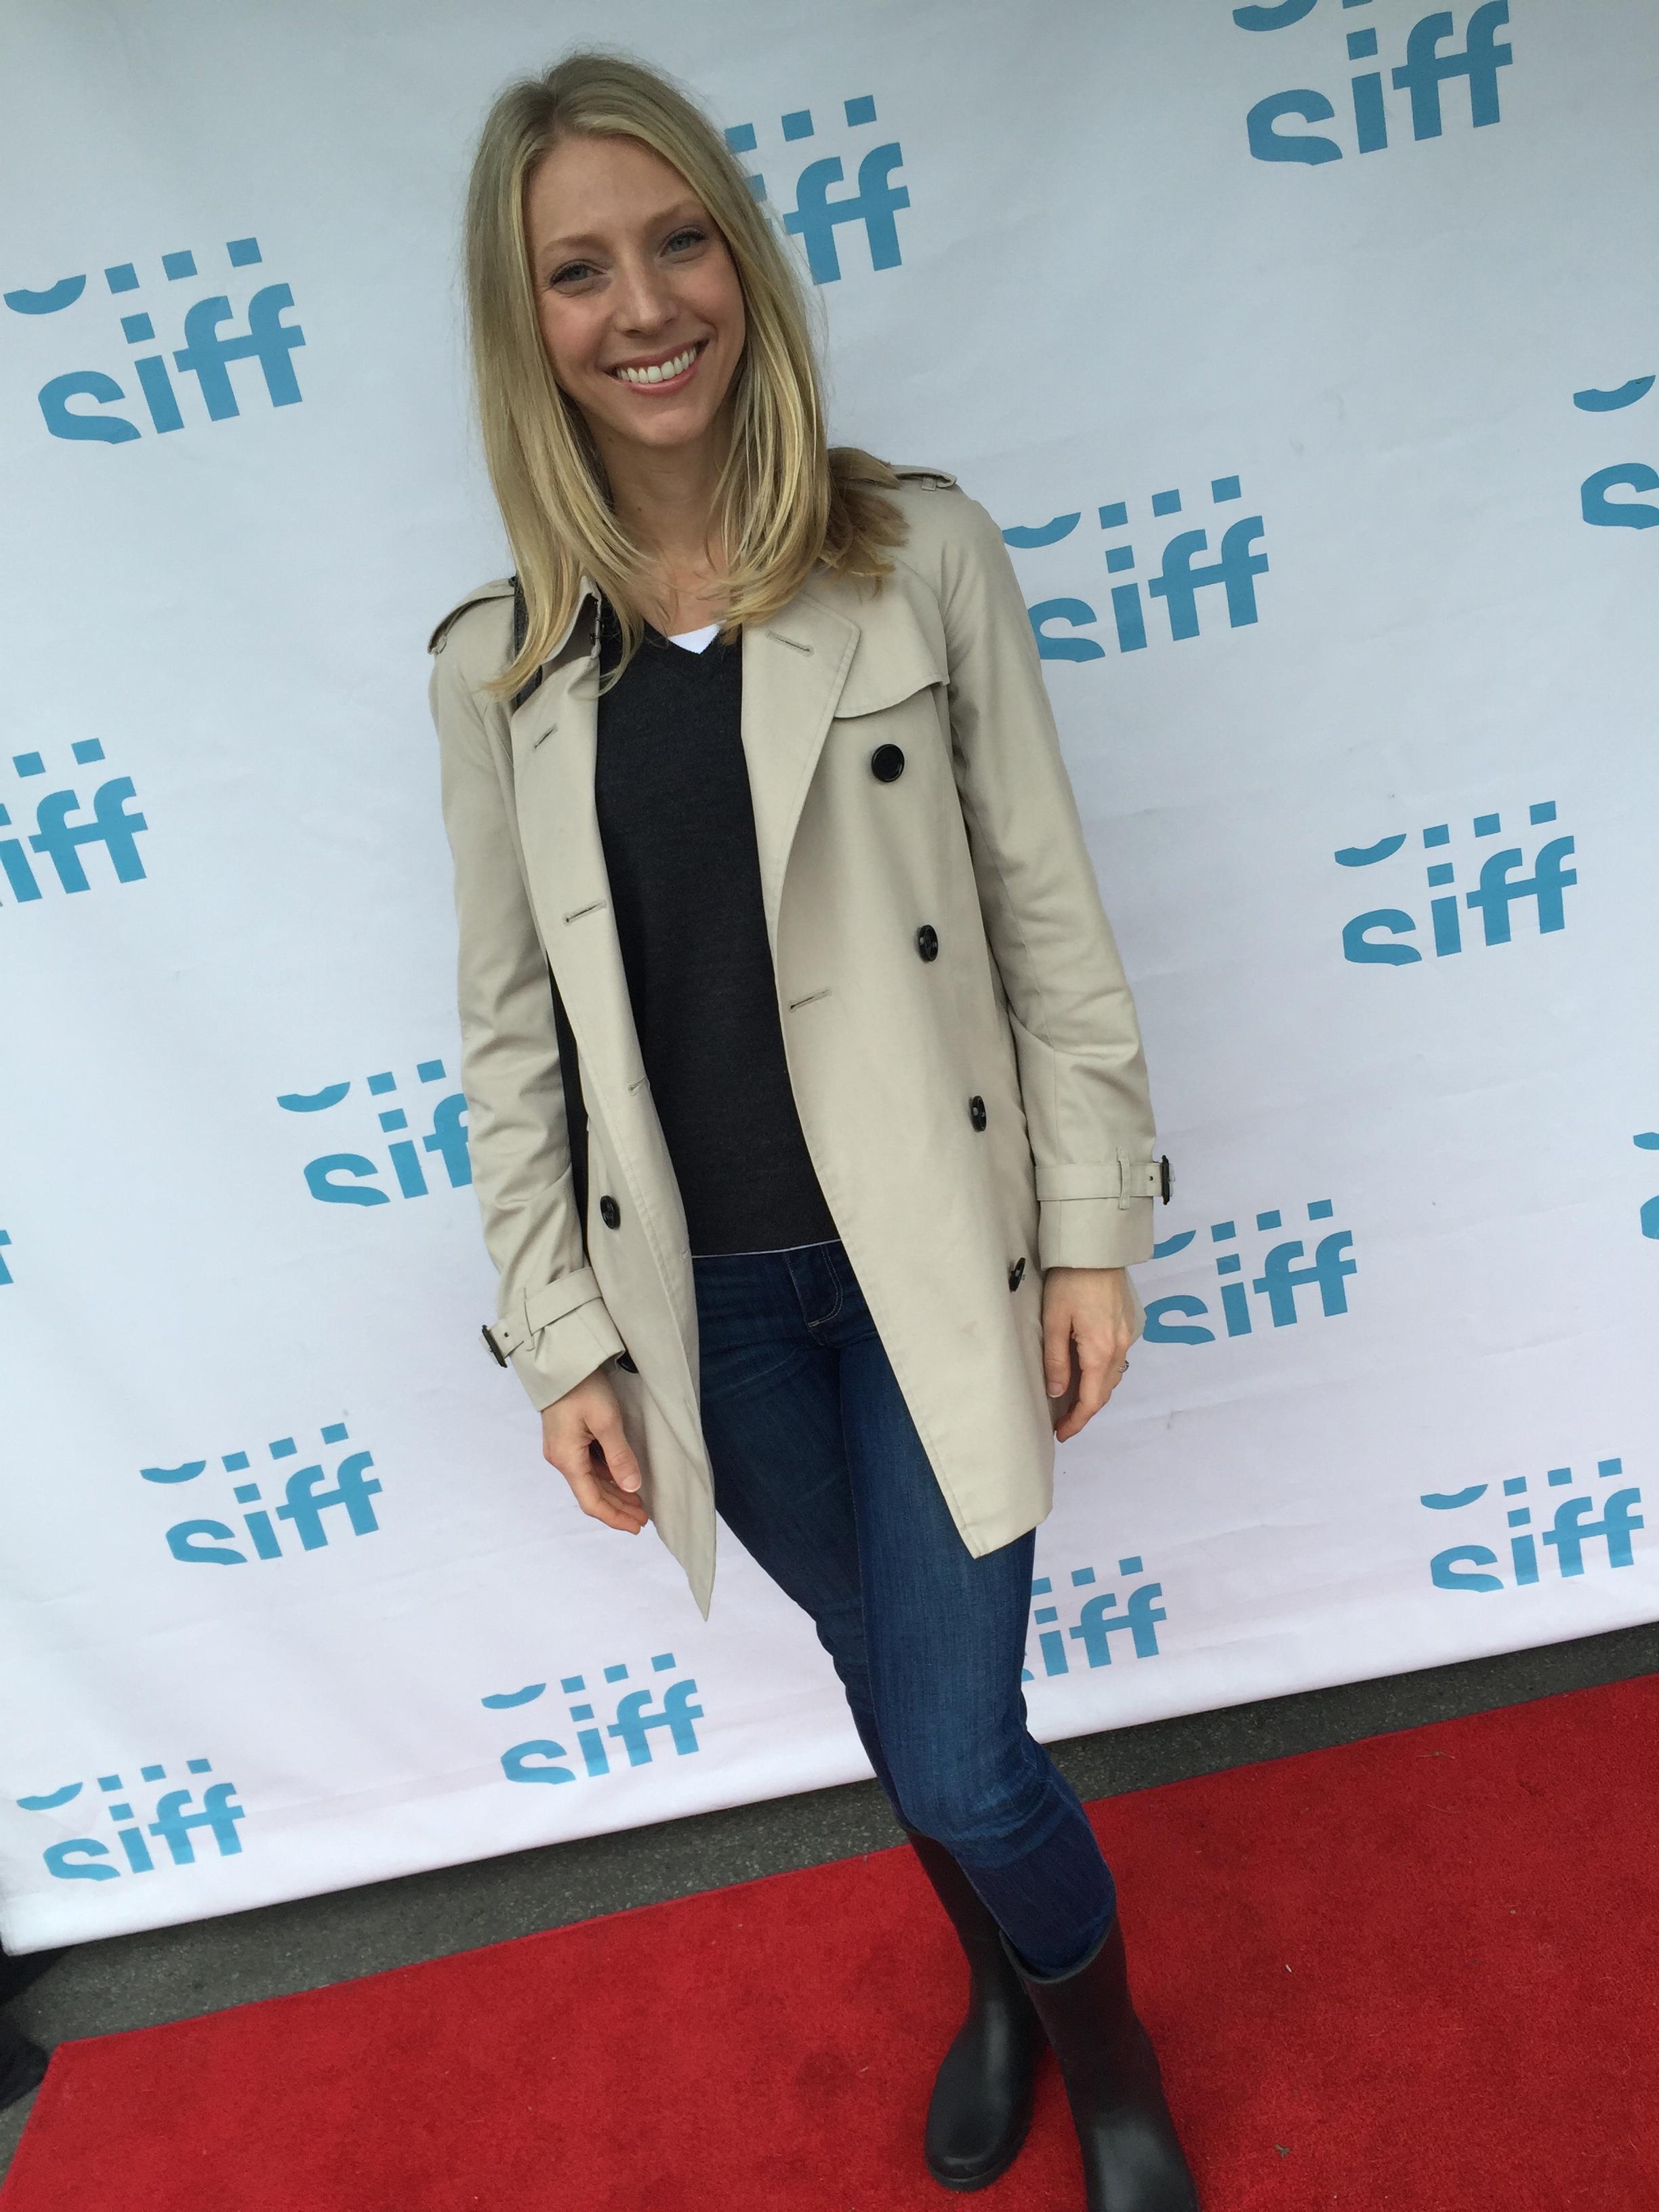 Seattle International Film Festival 2016